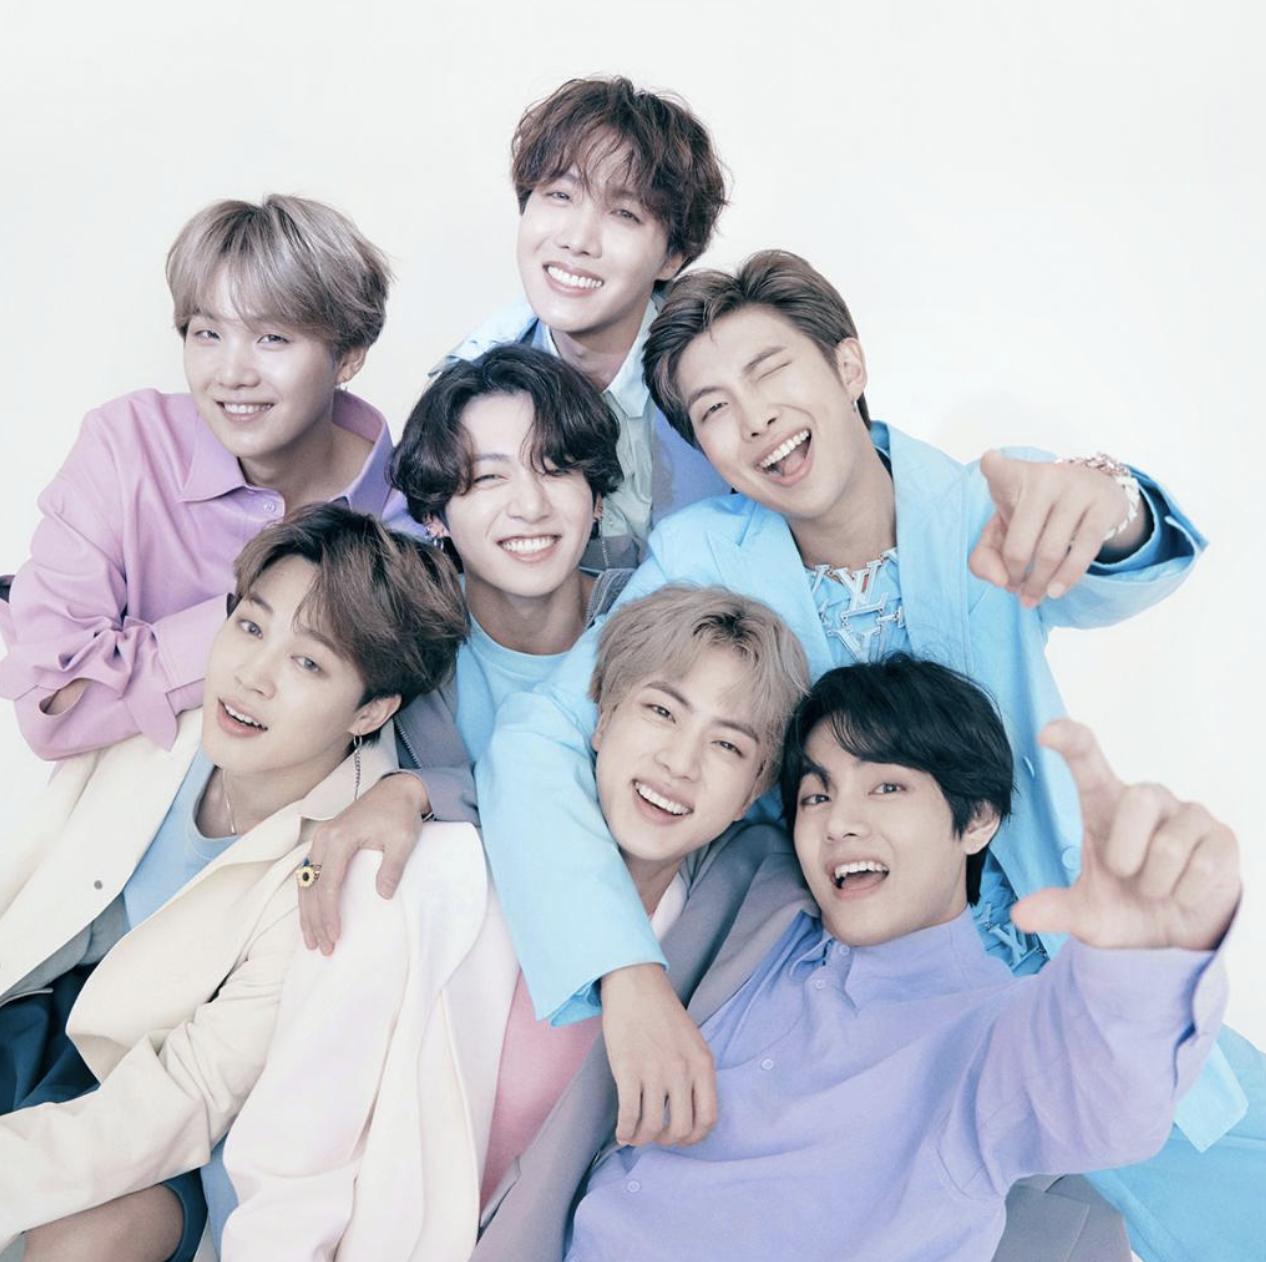 BTS Joins Louis Vuitton as its Newest Brand Ambassadors